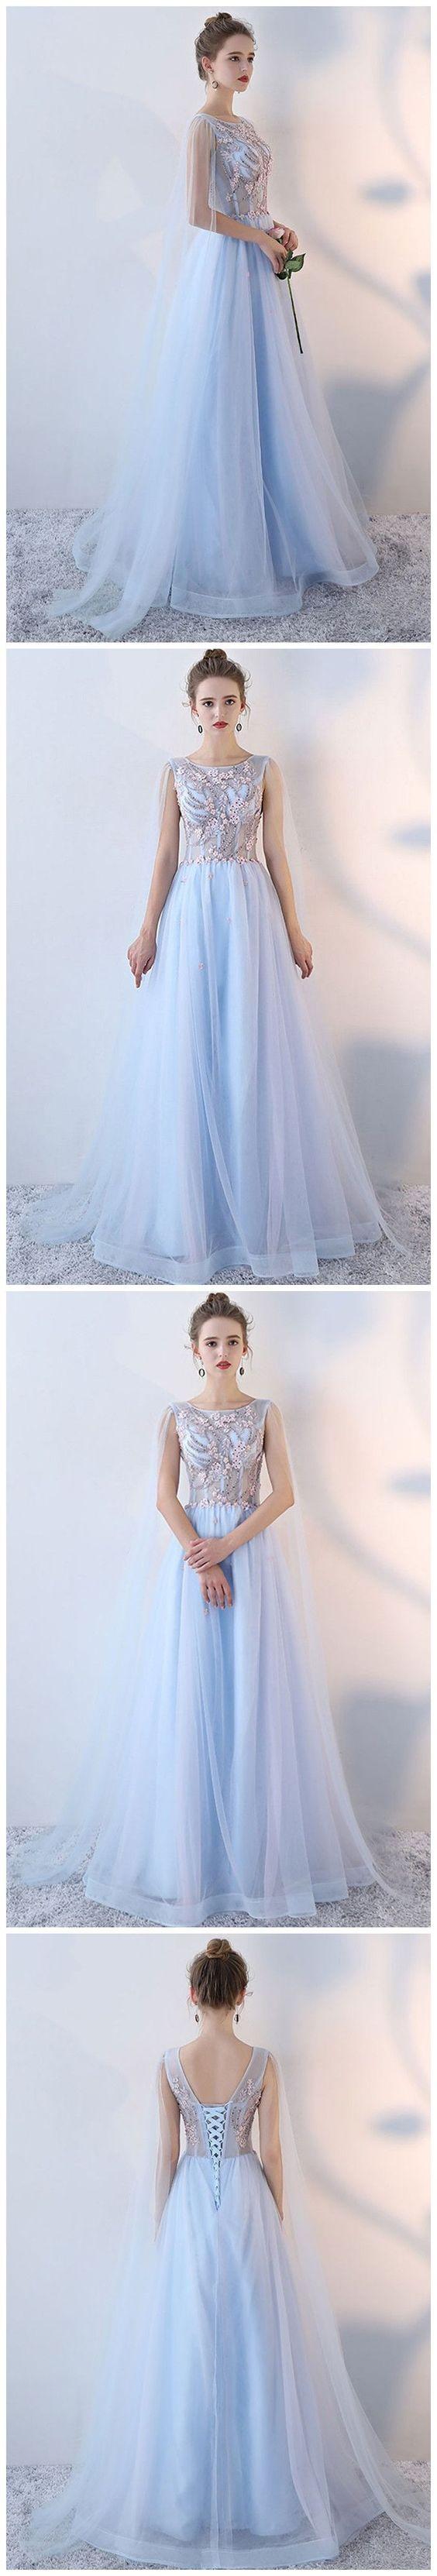 Aline prom dresses prom dresses simple prom dresses long m